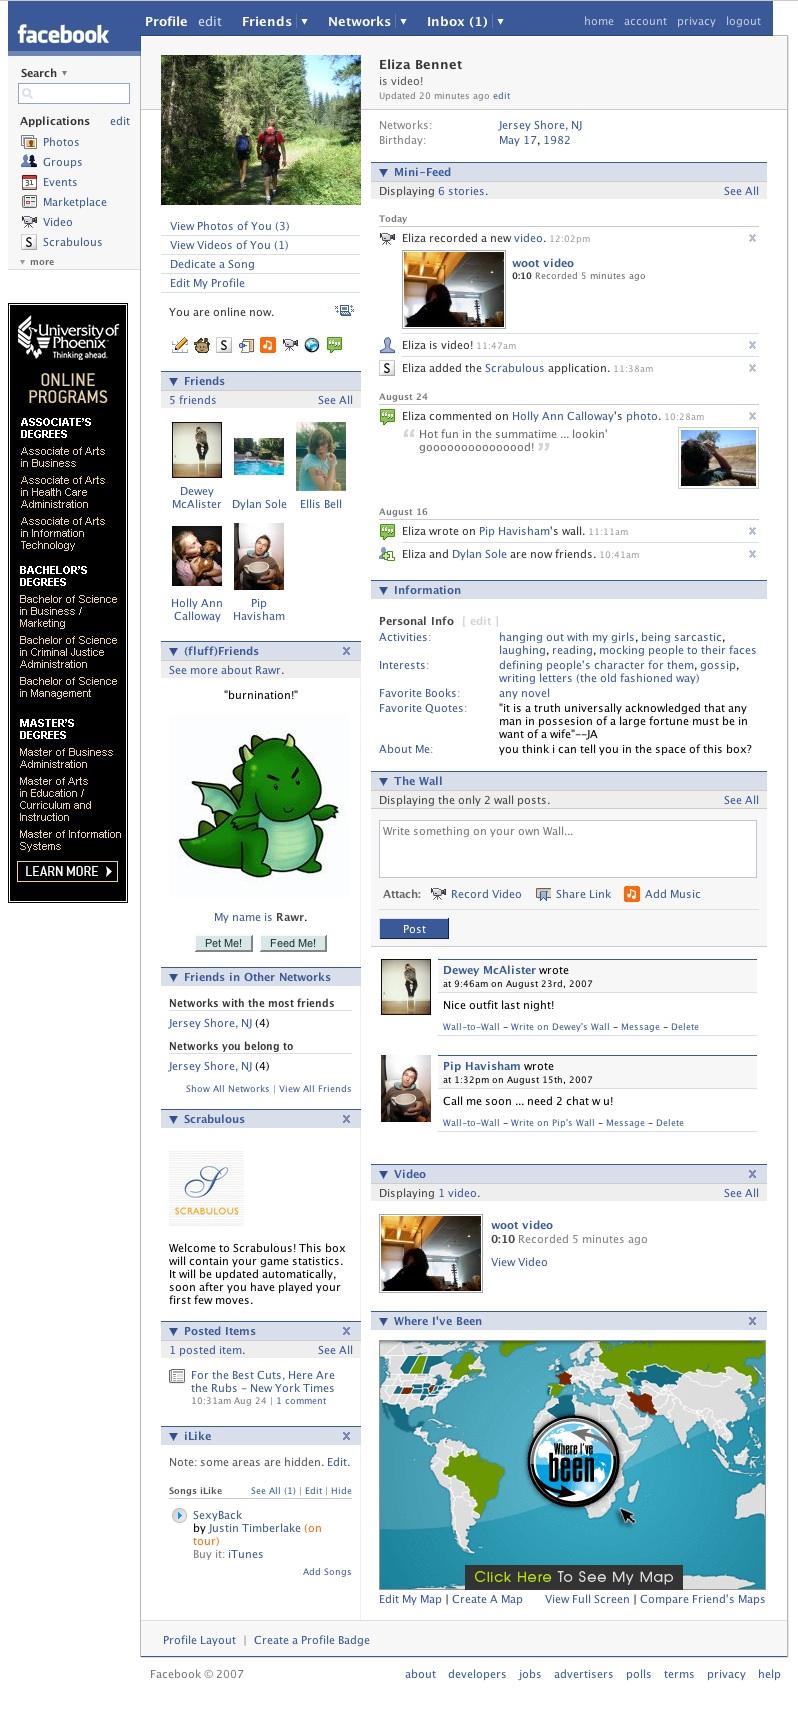 Facebook w 2007 roku